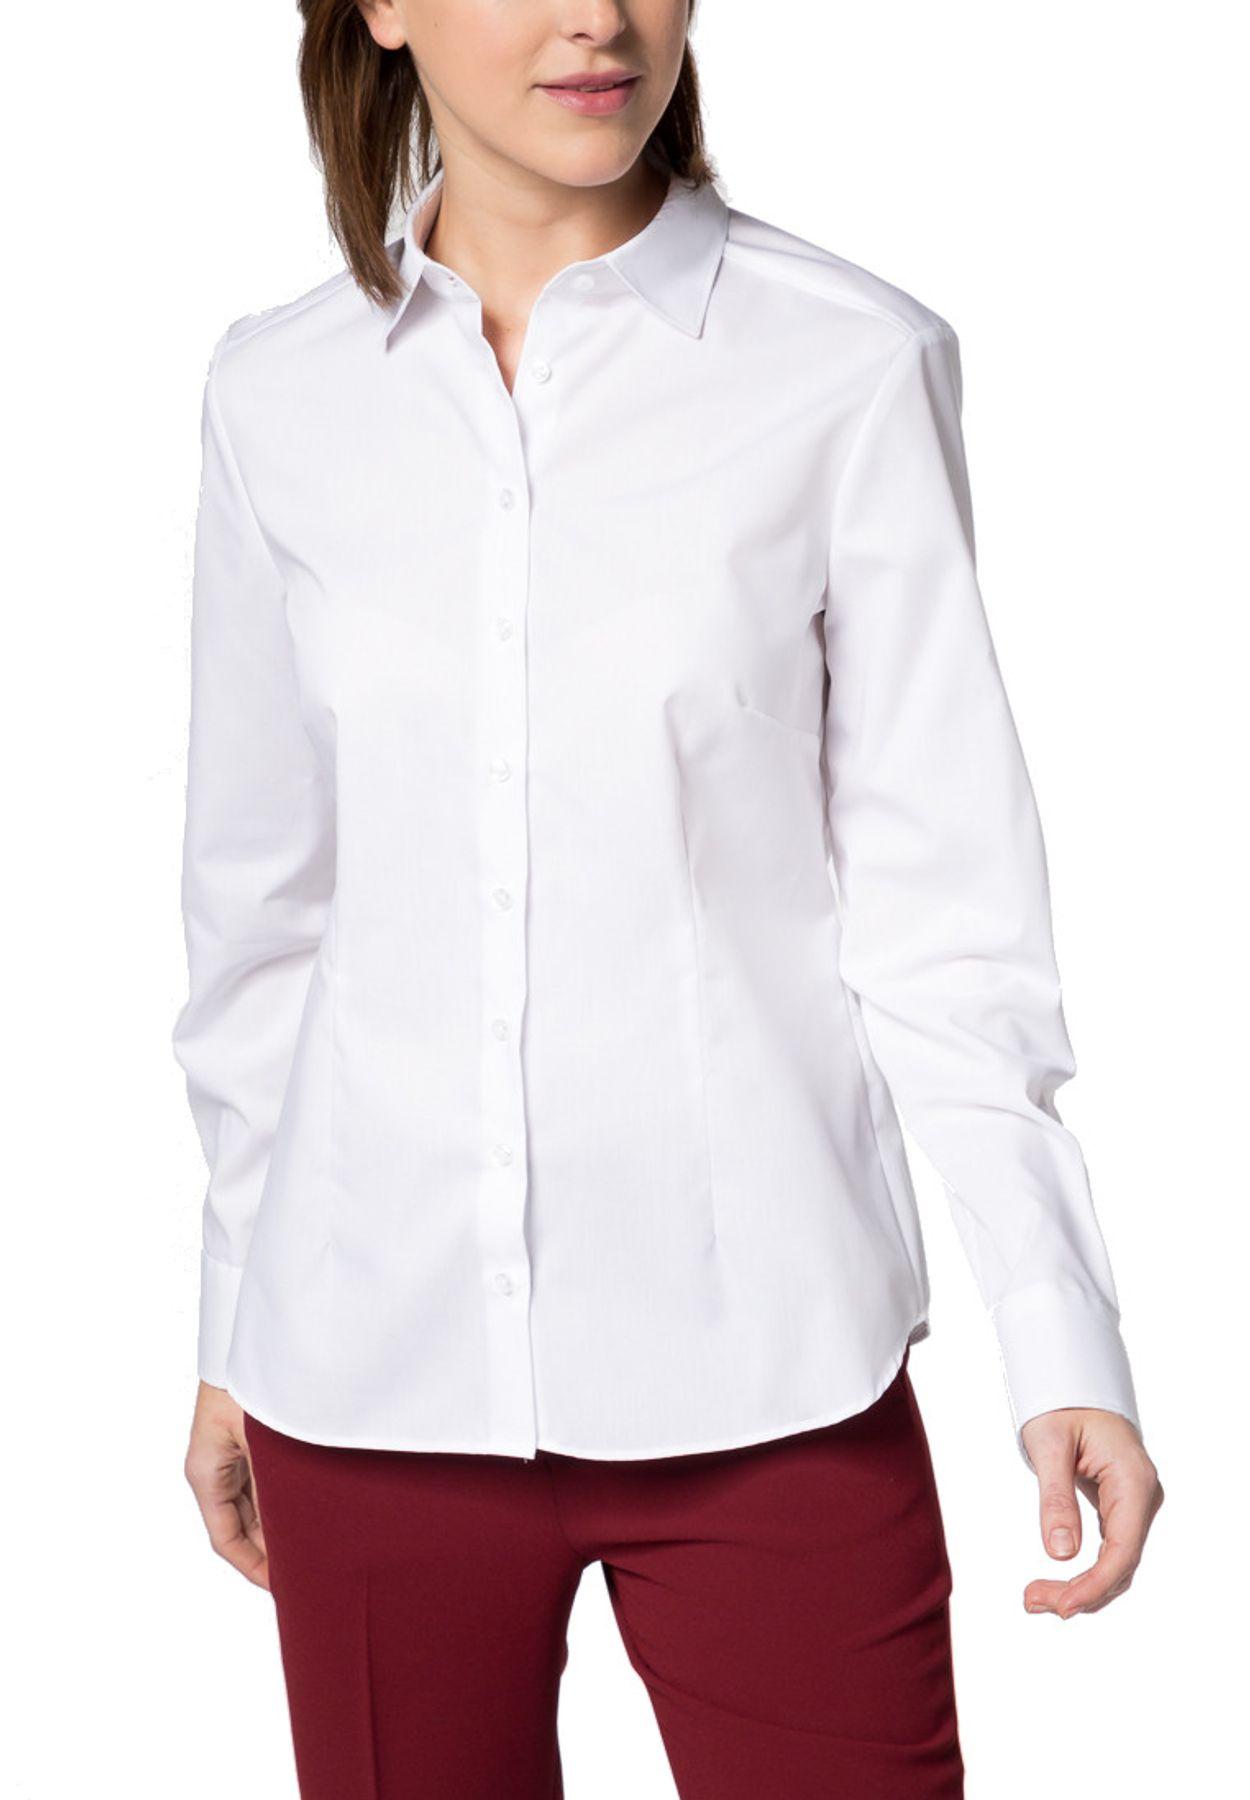 Eterna -  Comfort-Fit - Damen Langarm-Bluse Modern Classic Unifarben  (5220 D790) – Bild 1